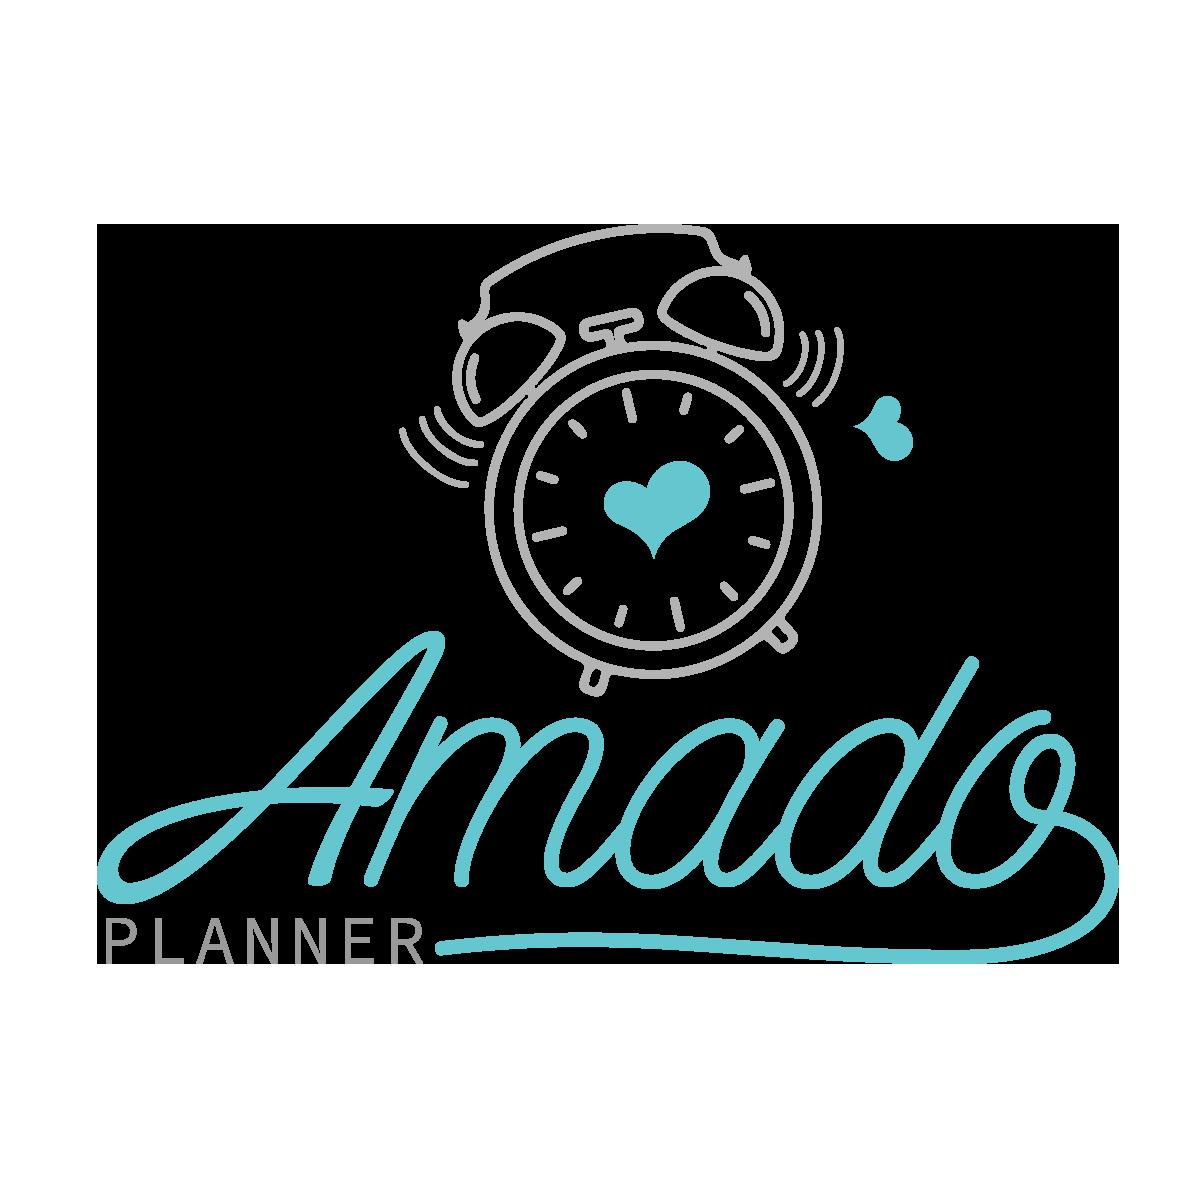 Amado Planner